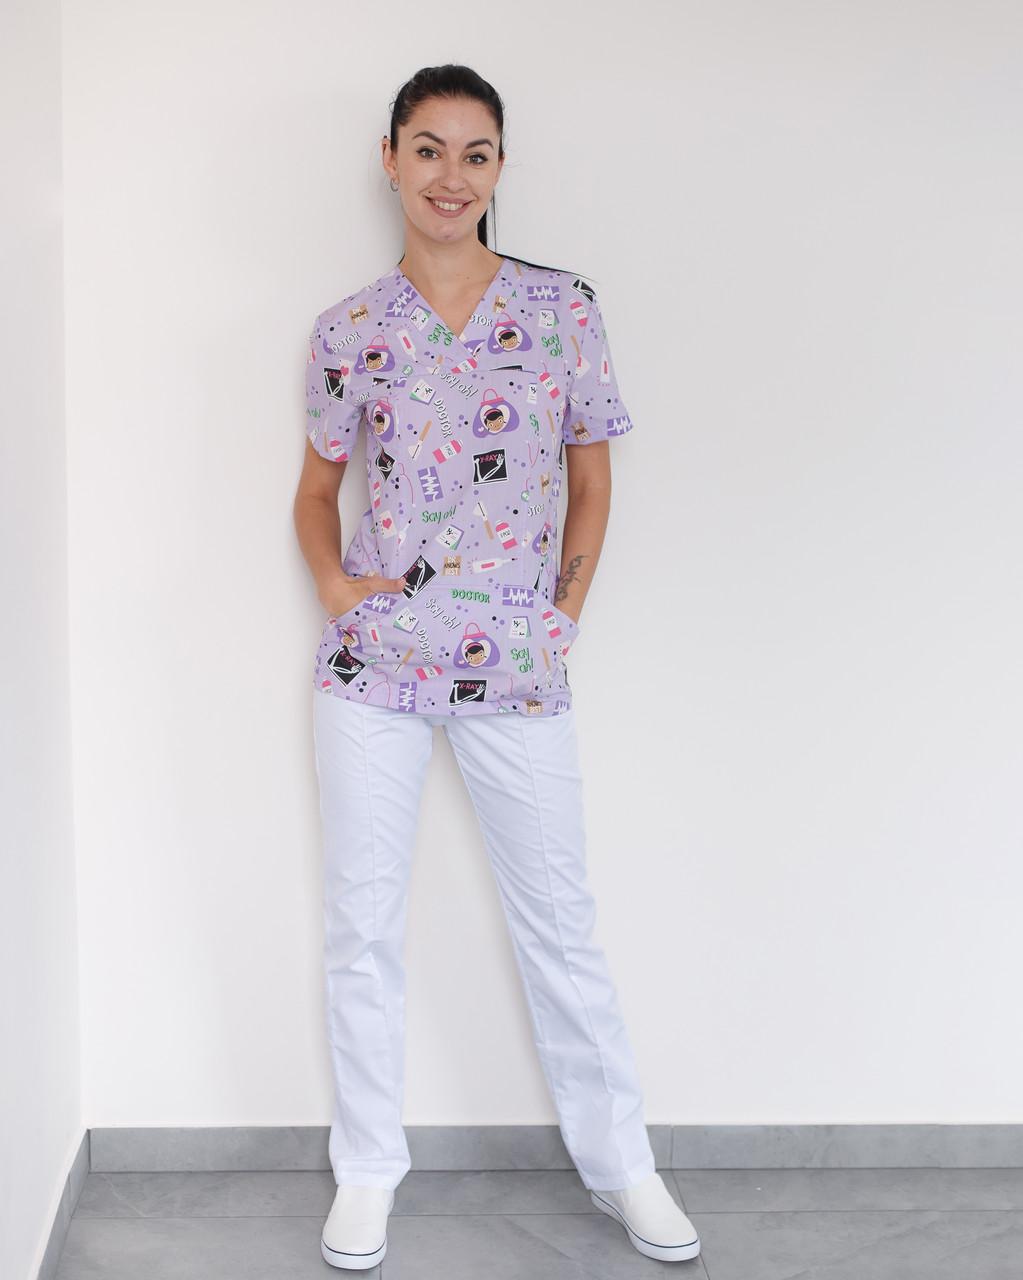 Медичний жіночий костюм Топаз принт Teeth smile